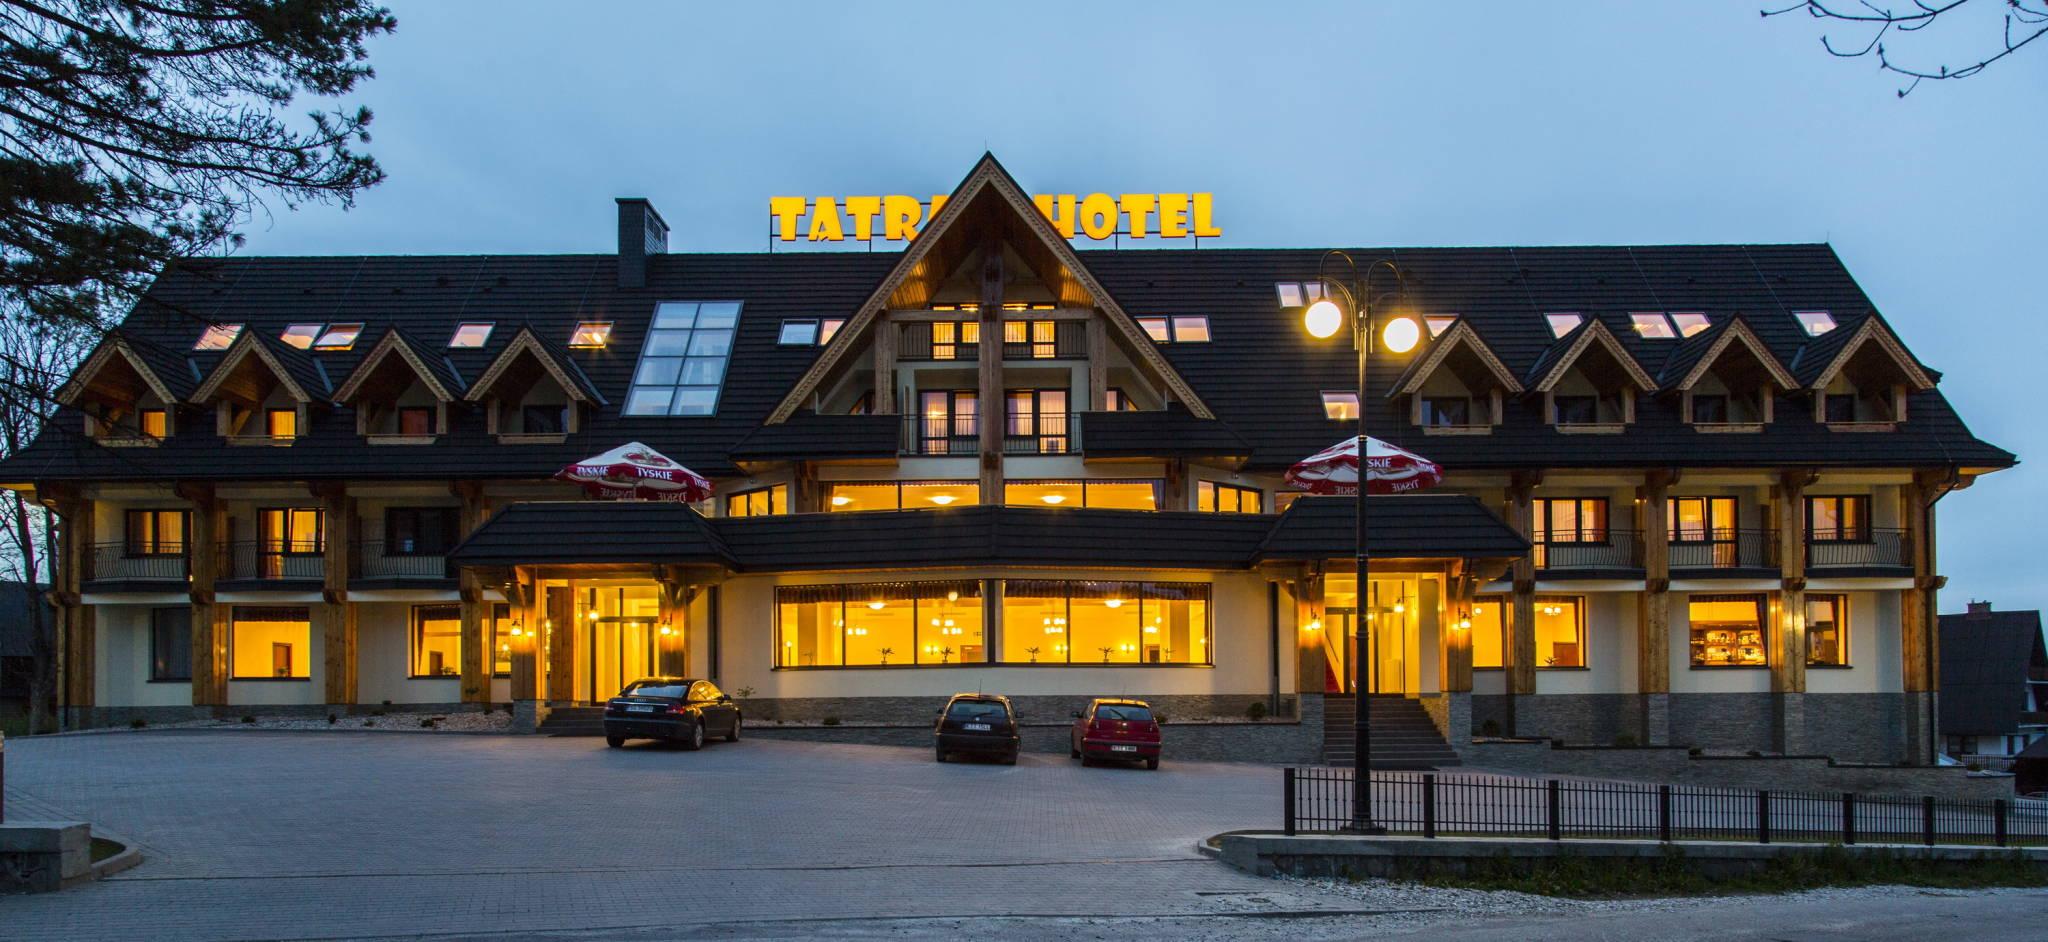 Hotel tatra zakopane for Hotels zakopane